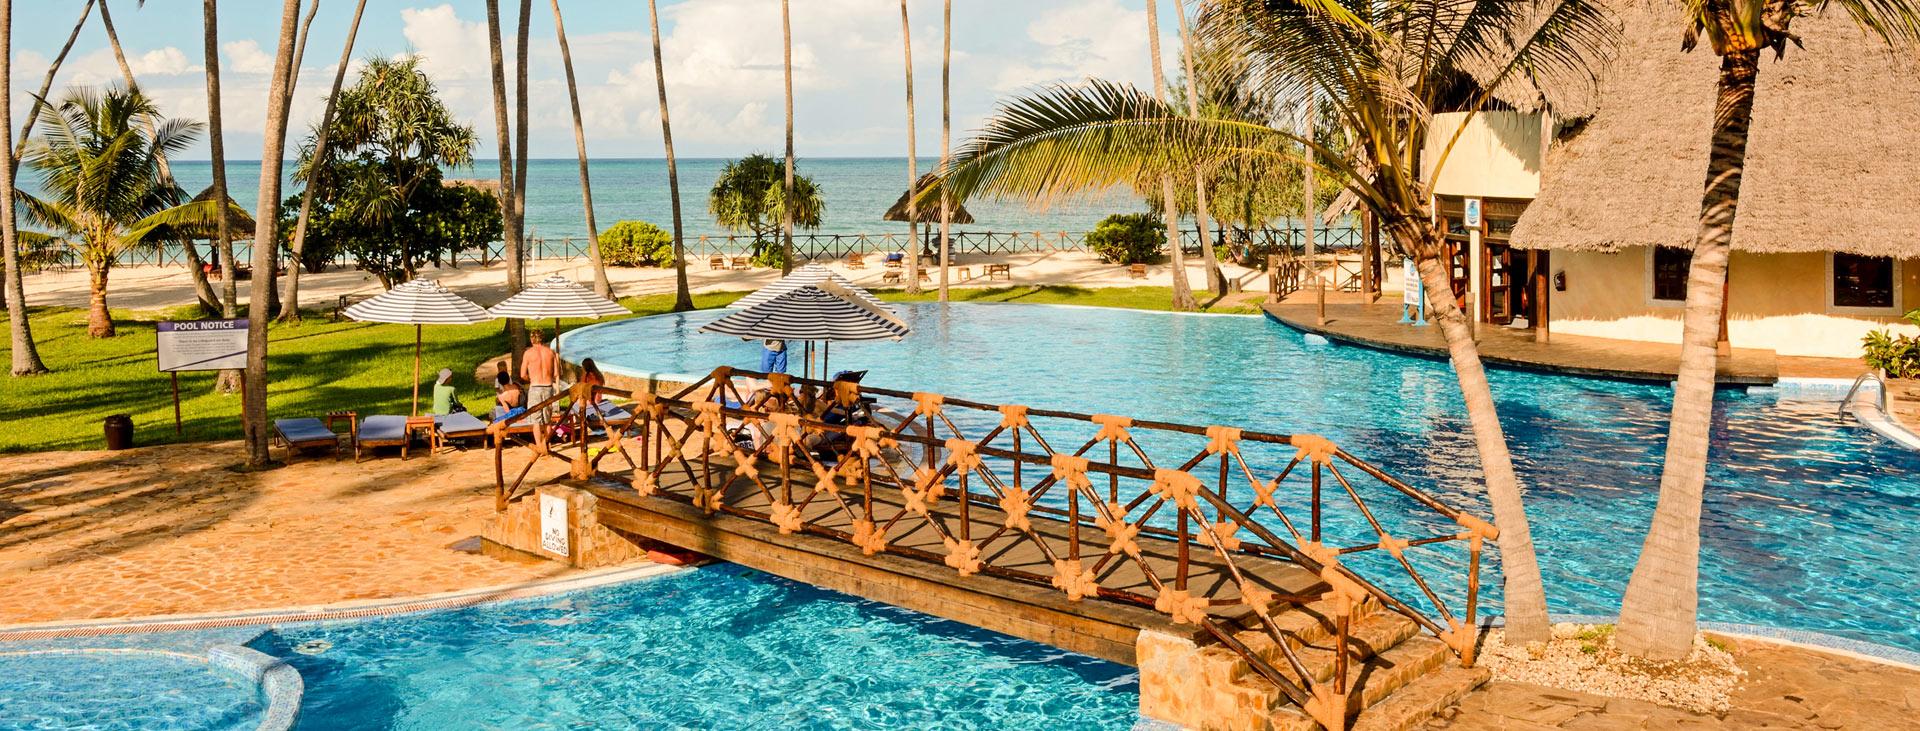 Ocean Paradise Resort & Spa, Sansibar, Tansania